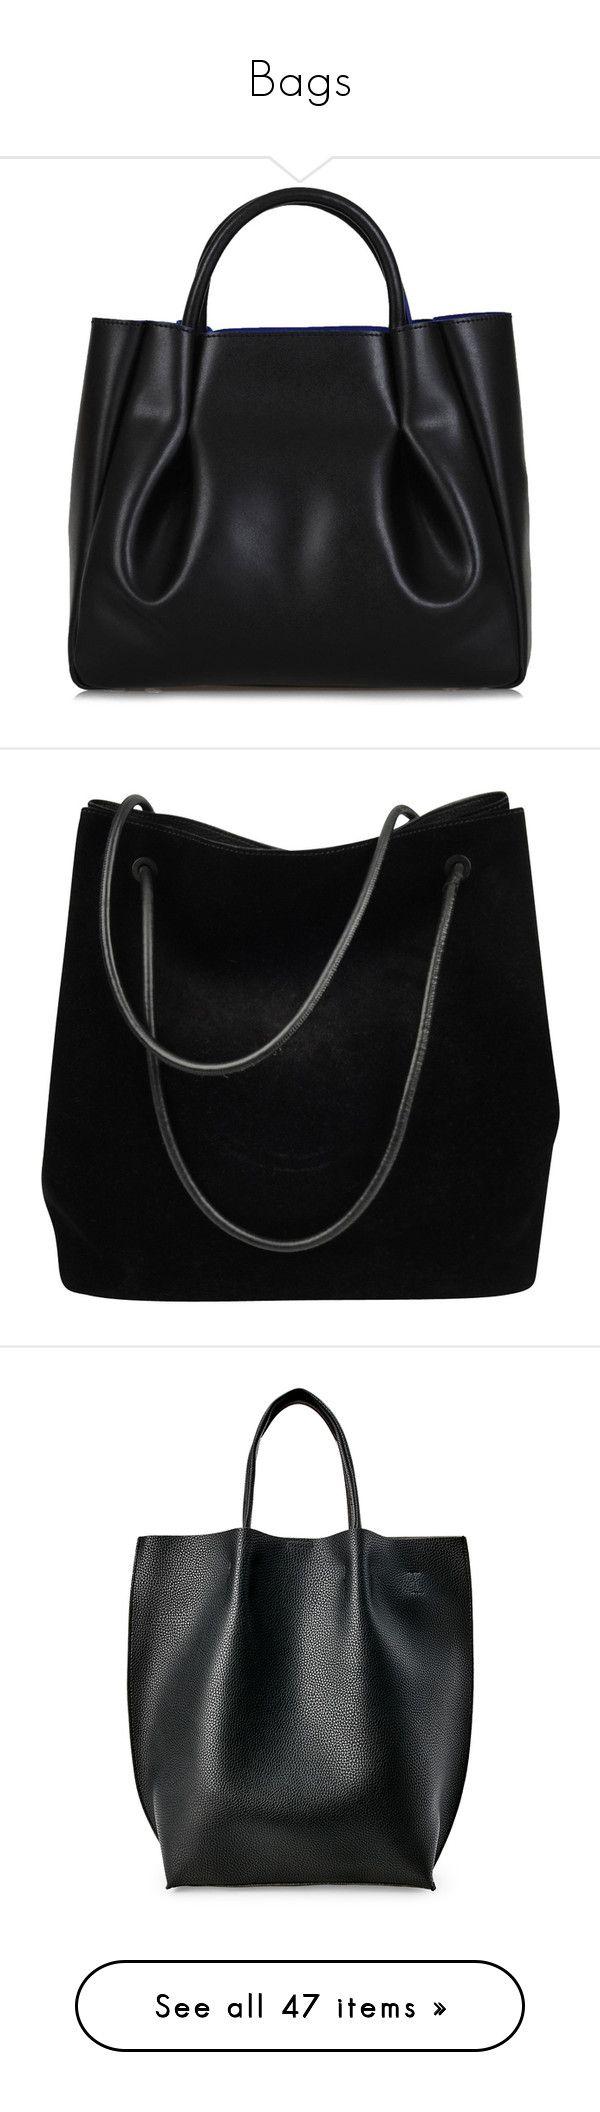 """Bags"" by random11-1 ❤ liked on Polyvore featuring bags, handbags, bolsa, miu miu, purses, black, velvet handbags, zipper purse, miu miu handbags and zip purse"